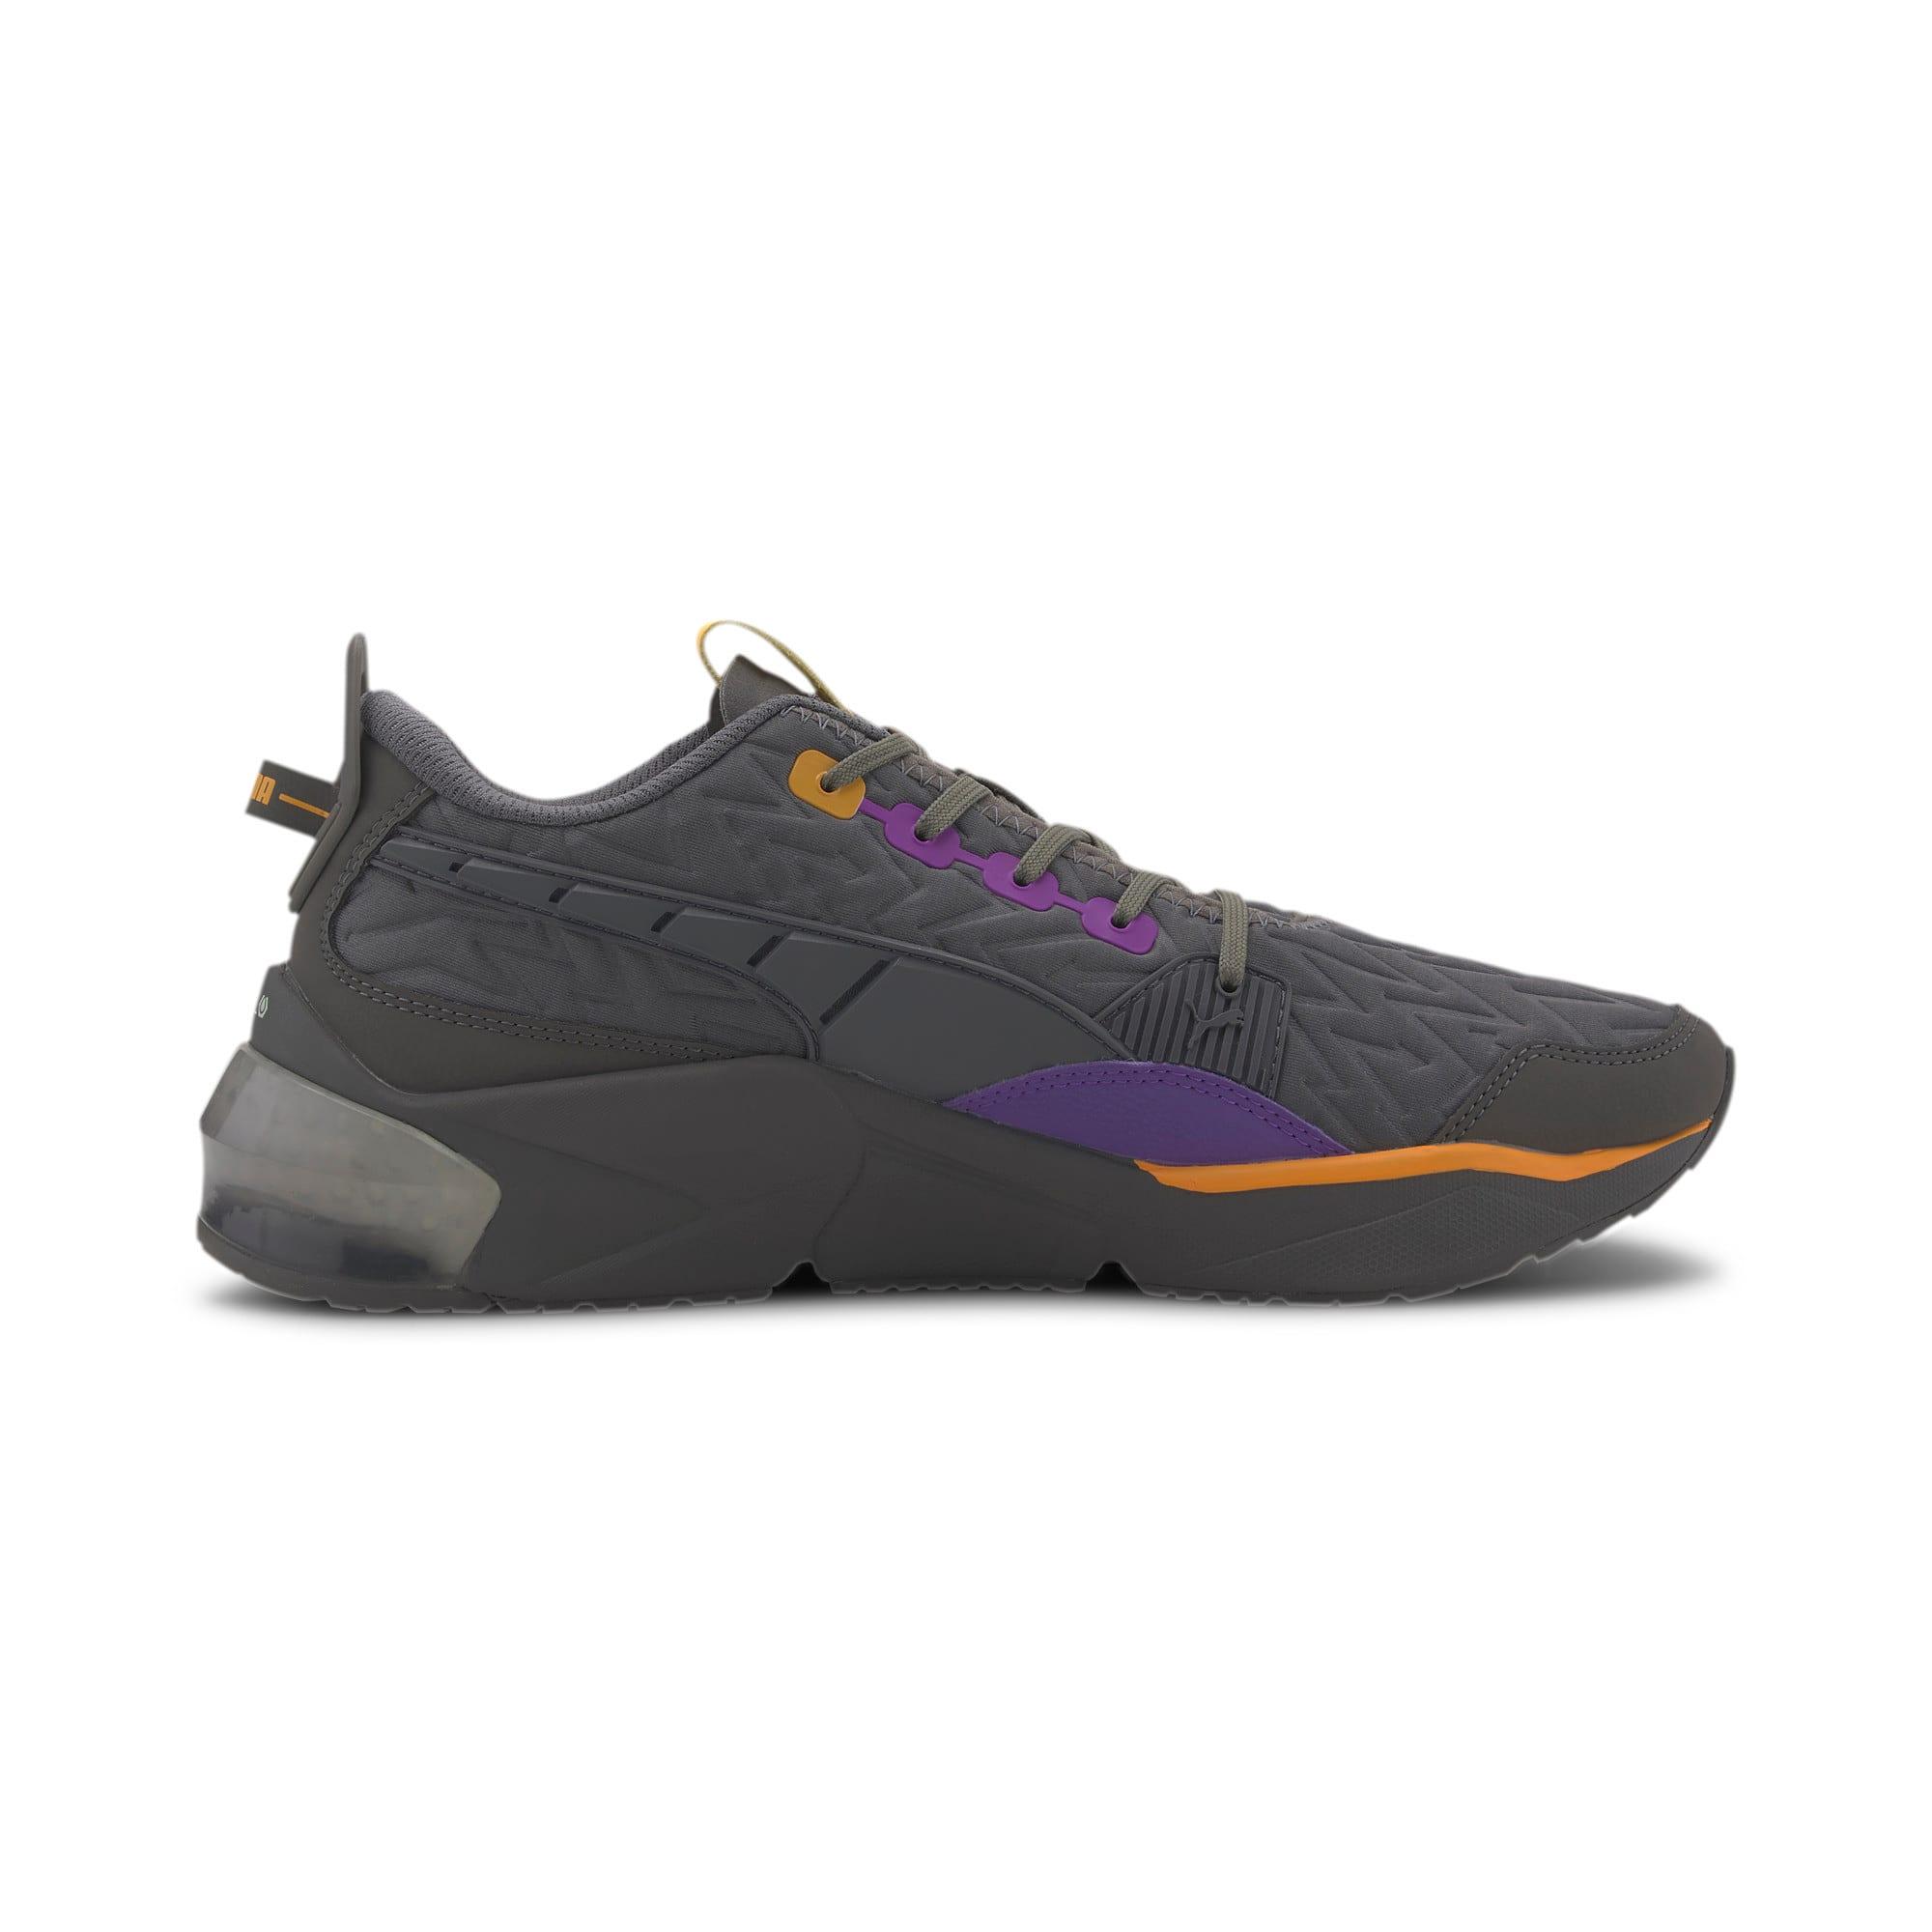 Thumbnail 5 of LQDCELL Optic Rave Men's Running Shoes, CASTLEROCK-Purple Glimmer, medium